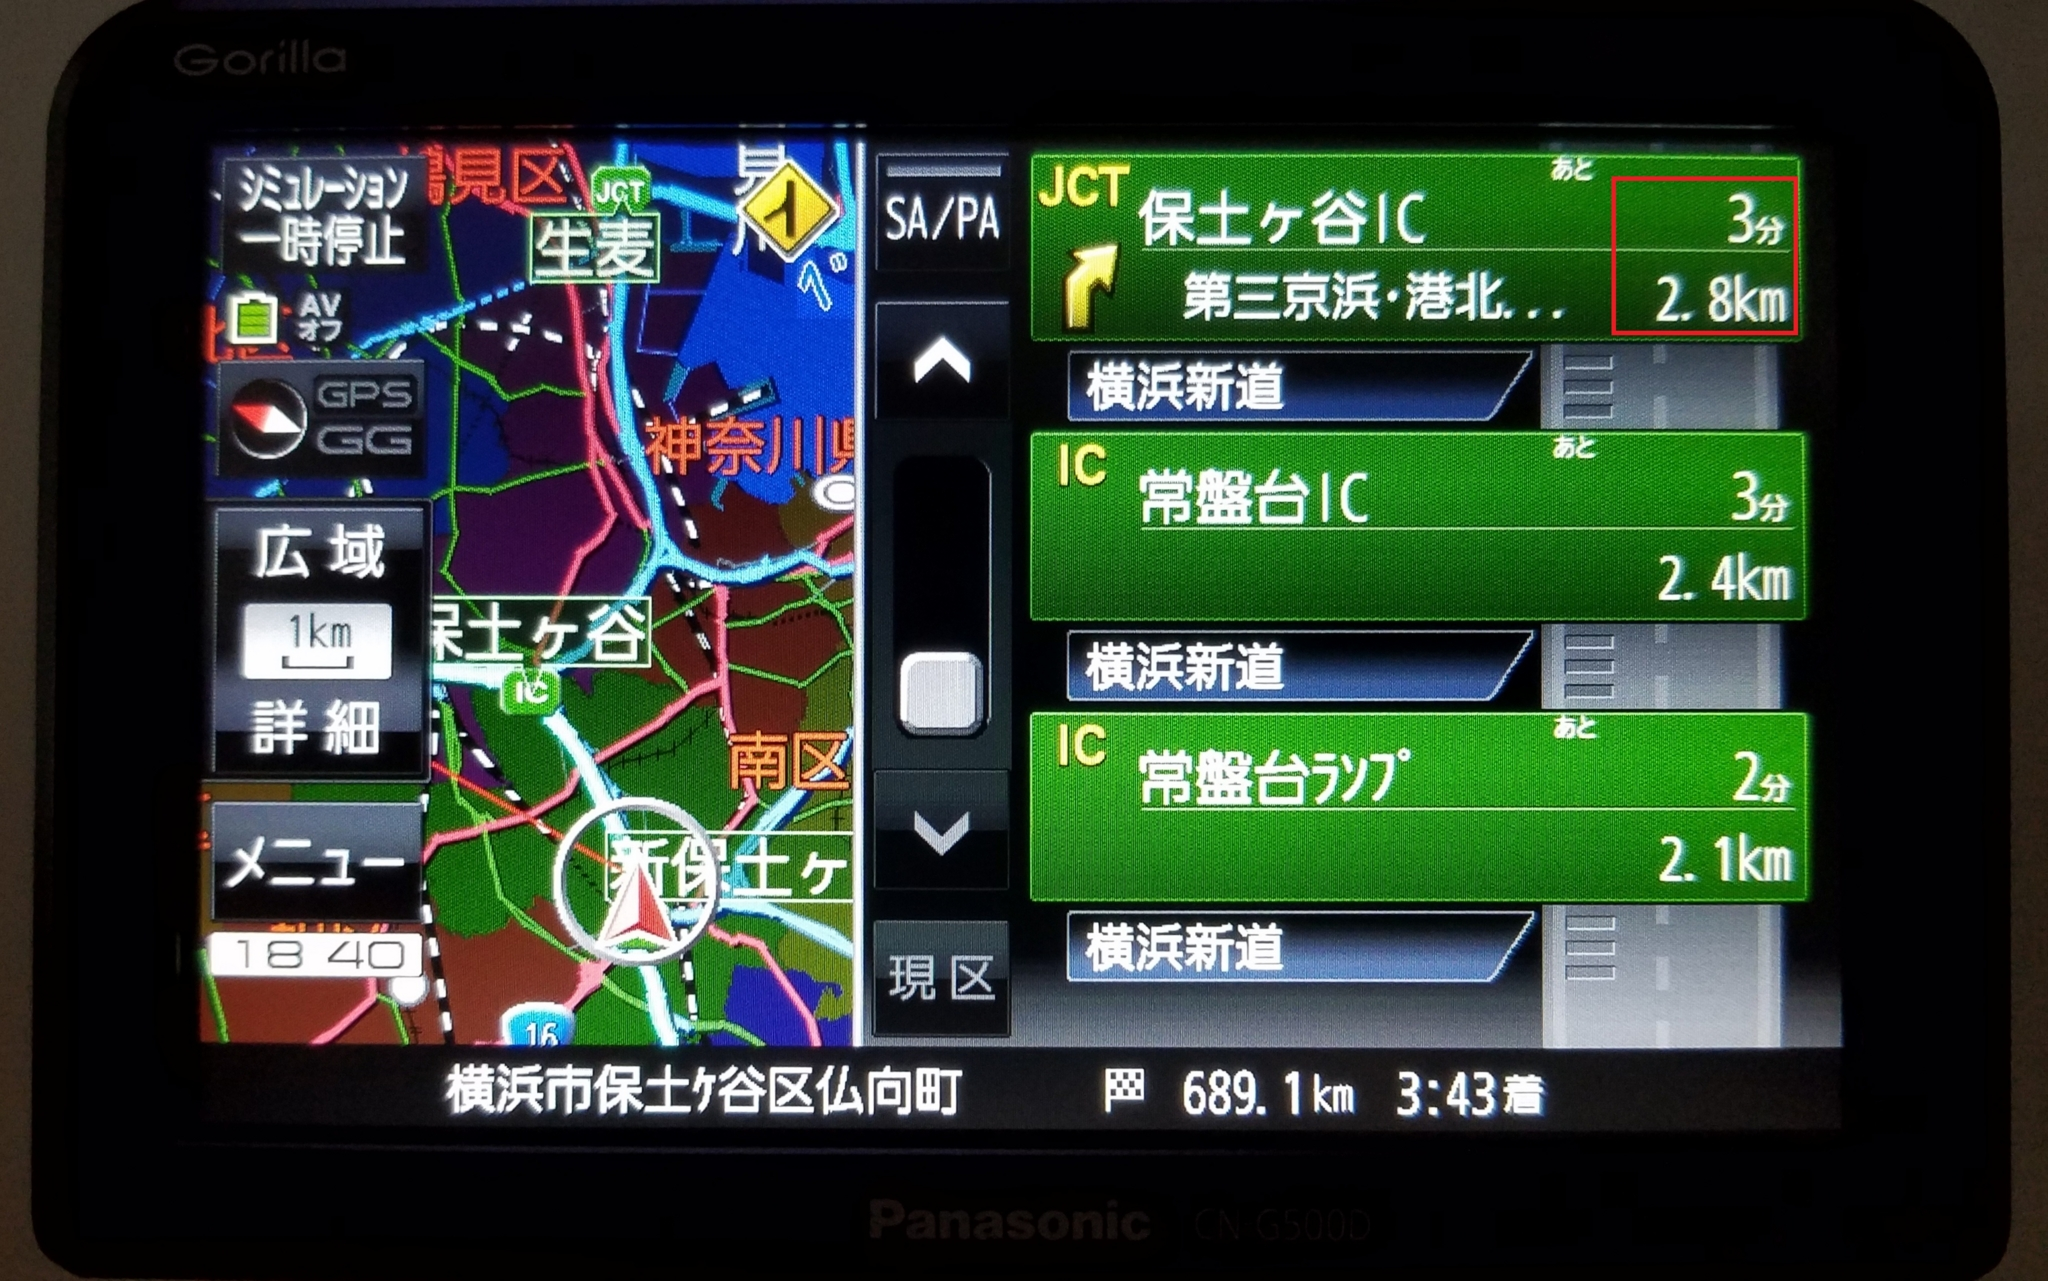 f:id:ToshUeno:20160925184032j:plain